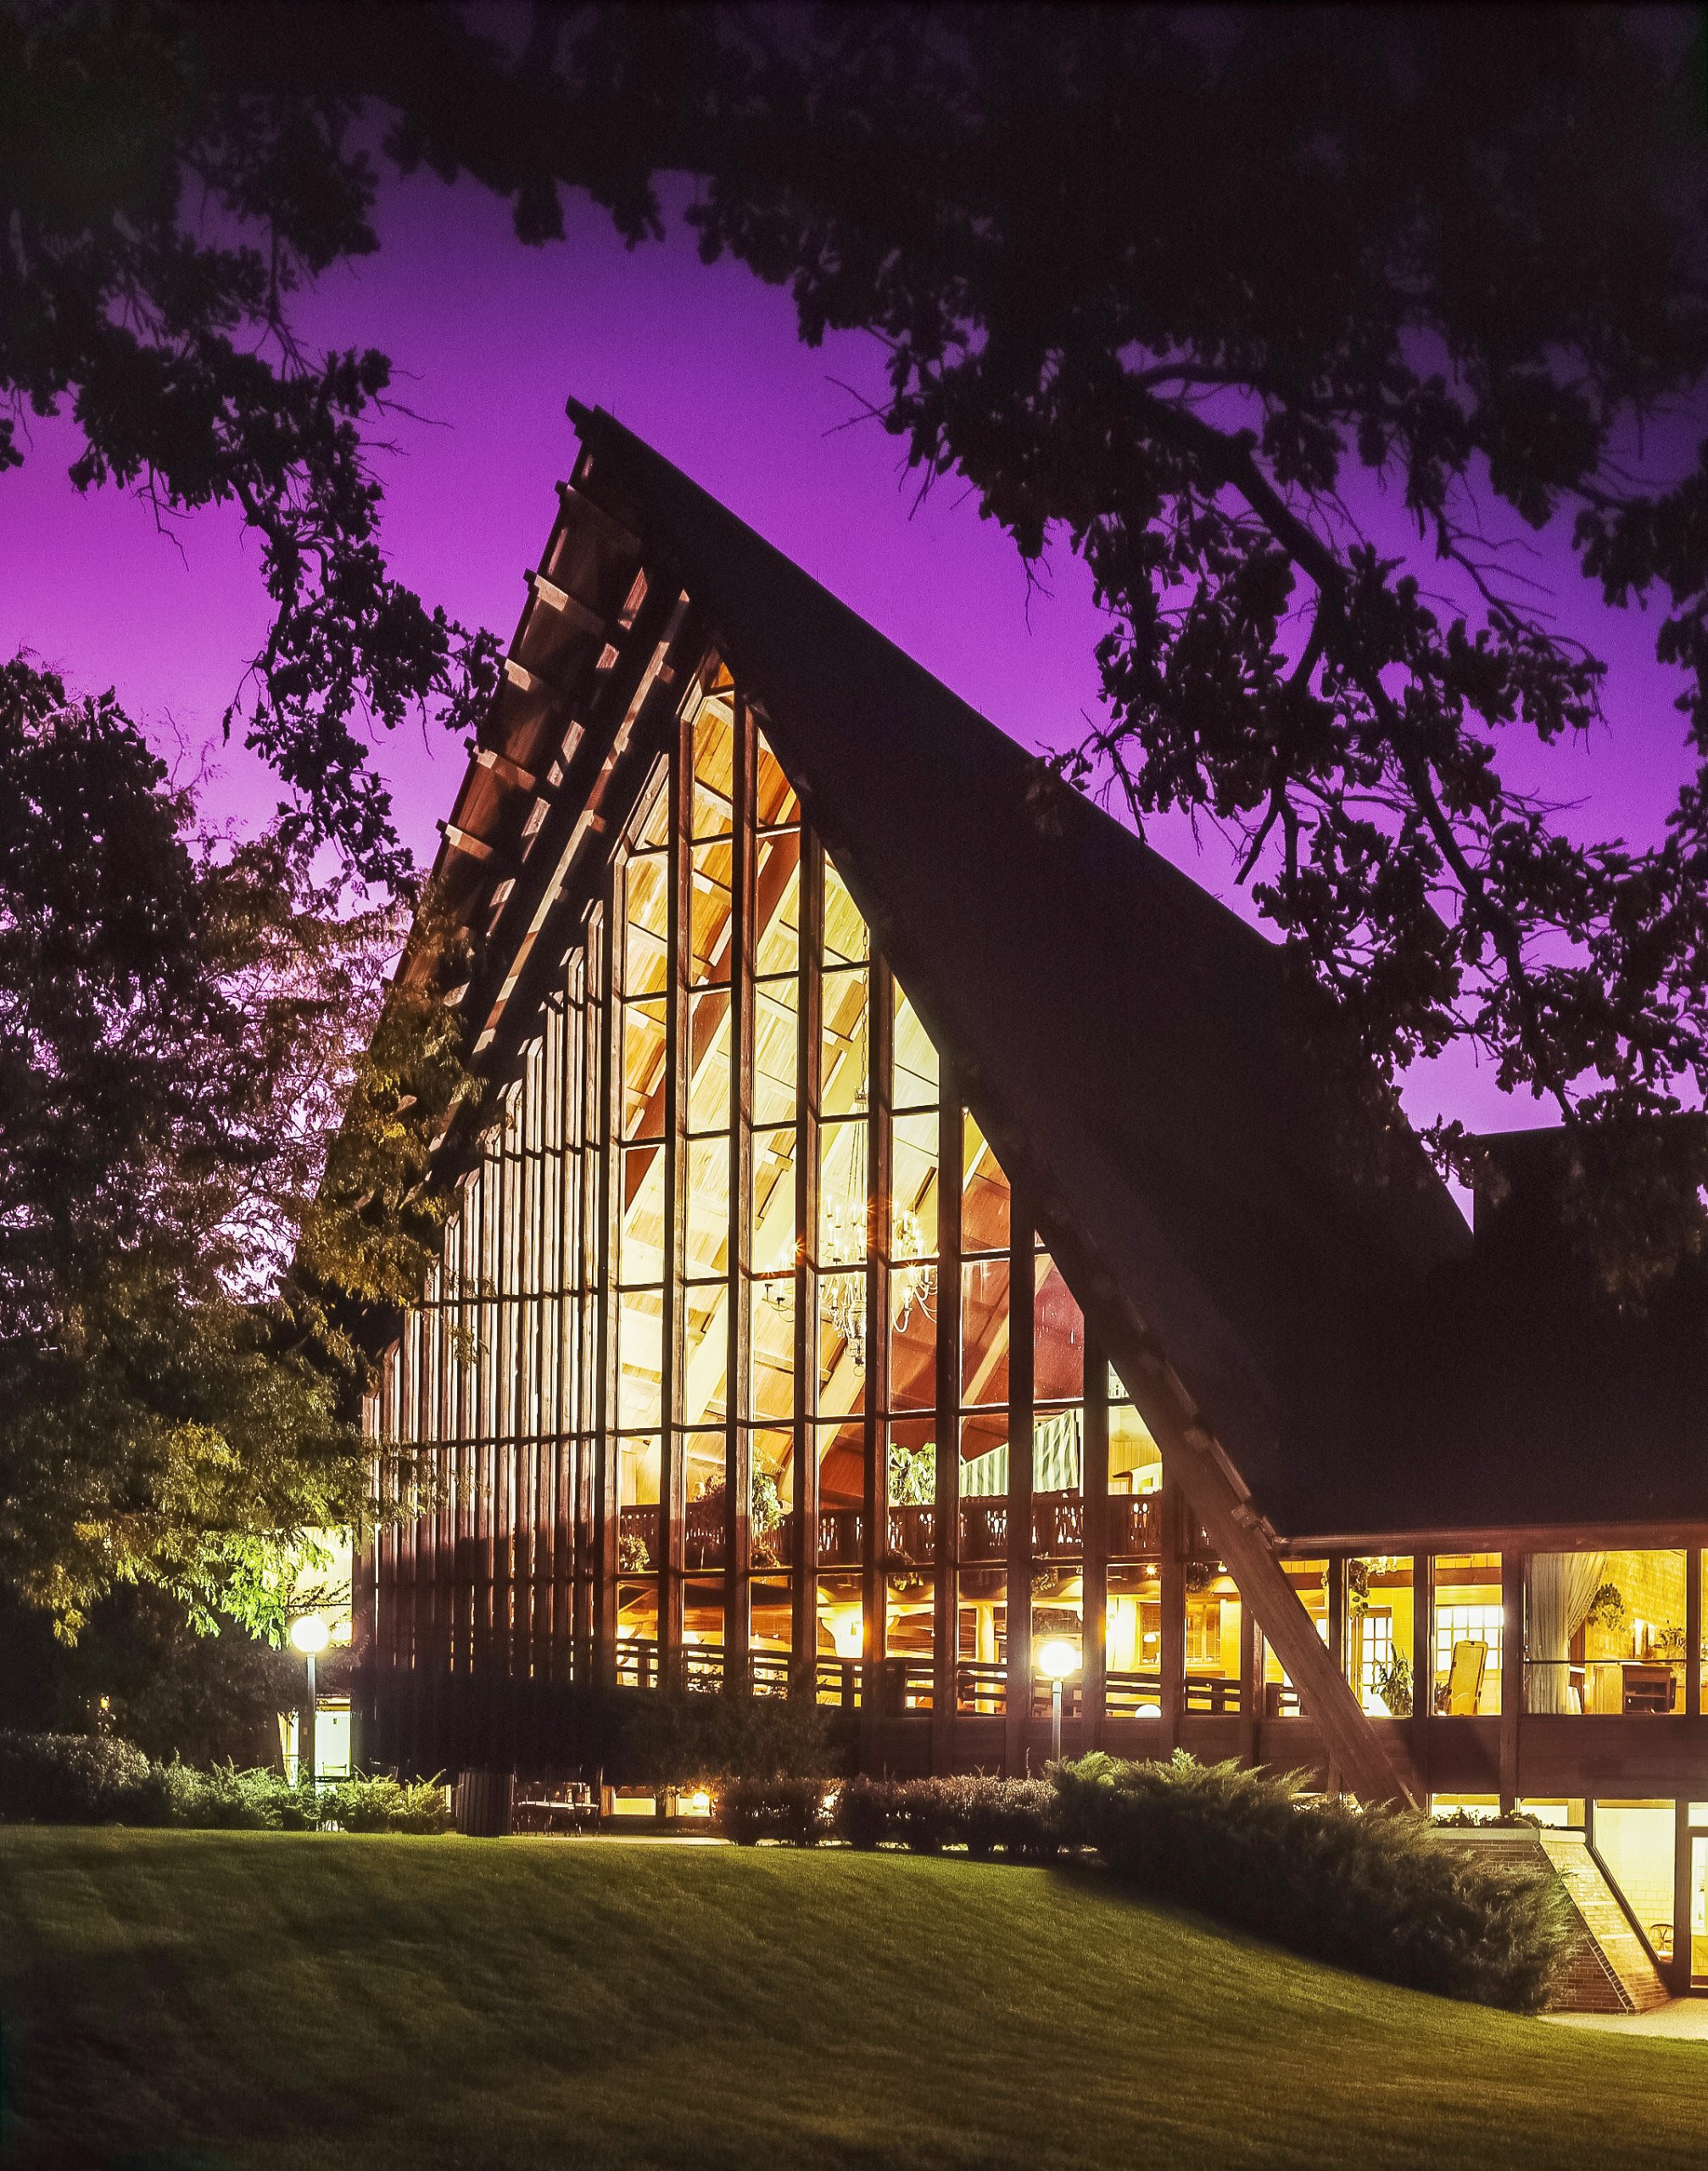 The Abbey at Lake Geneva, Wisconsin - registration